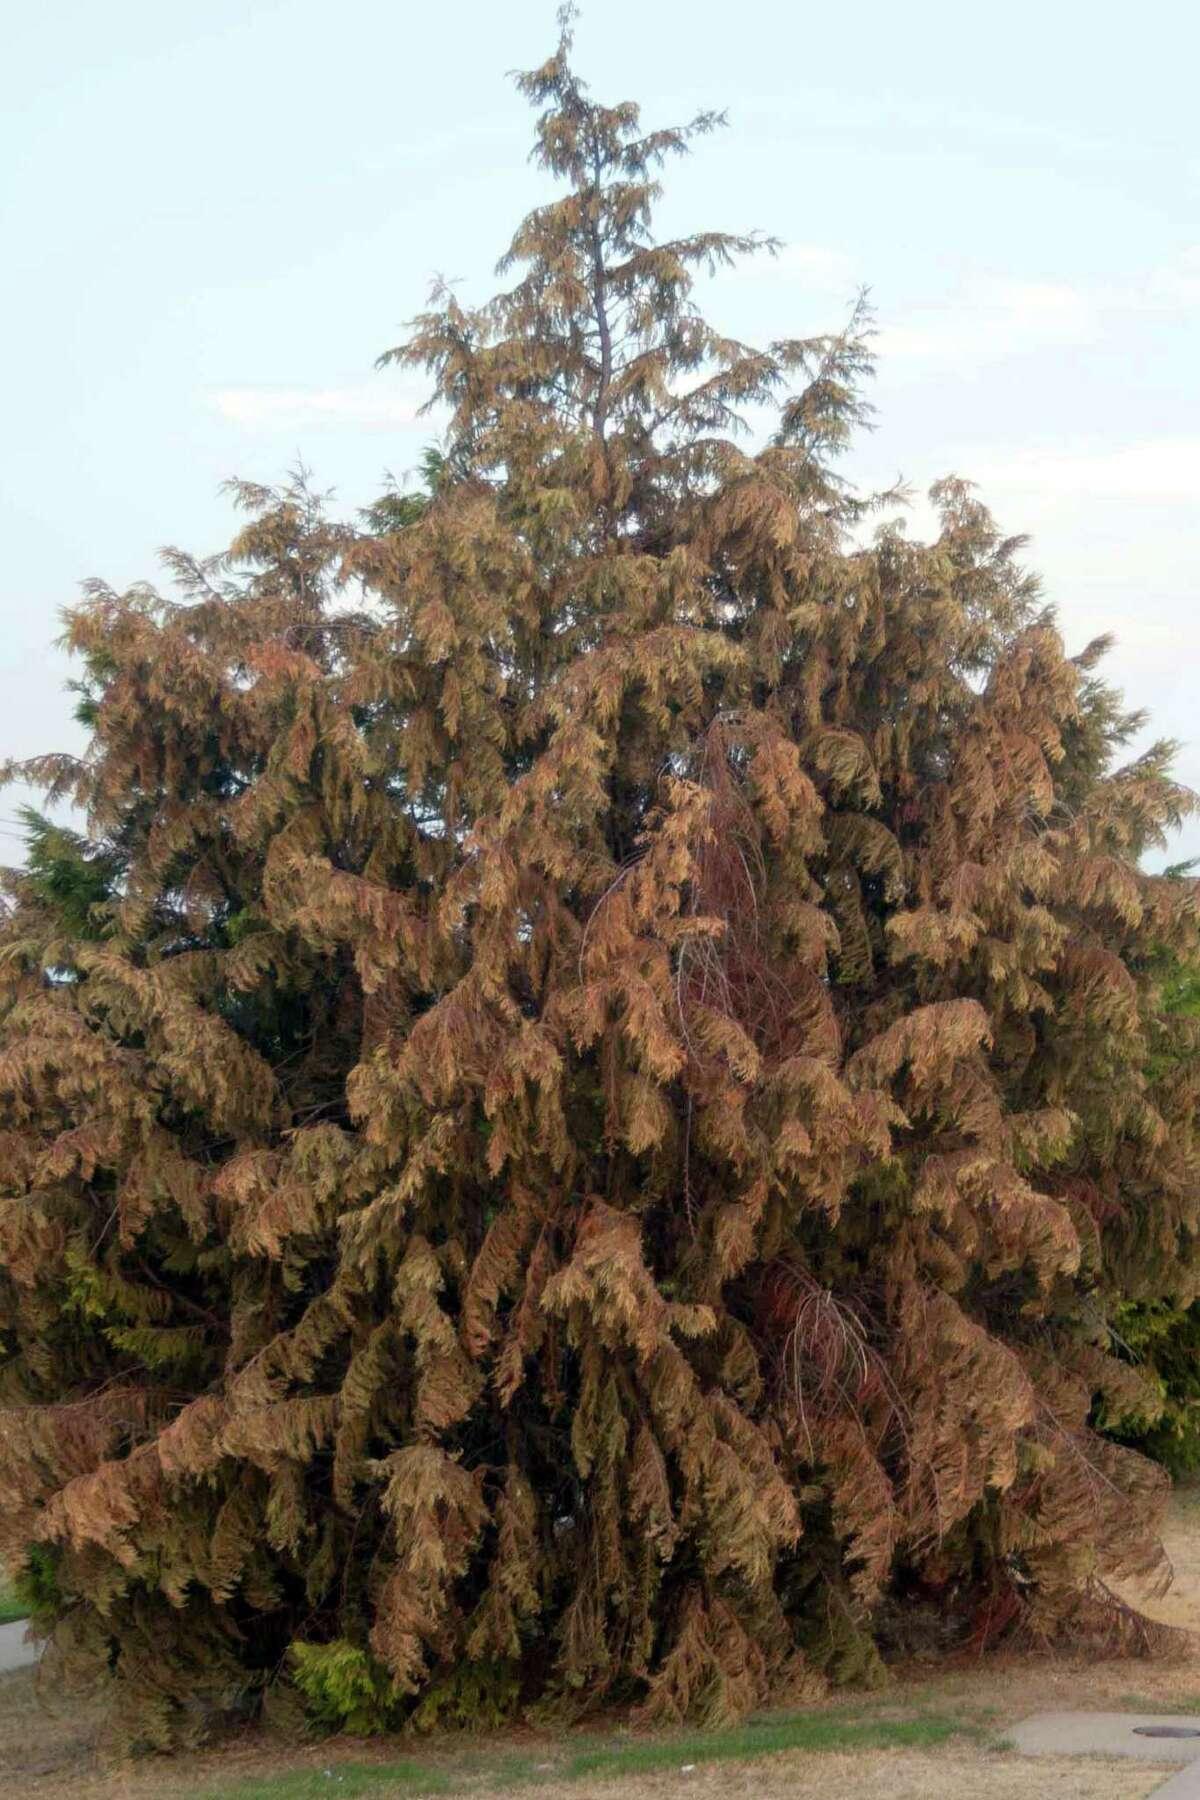 Seiridium canker has felled thousands of Leyland cypress trees across the state. Eastern red cedar juniper is a good alternative.